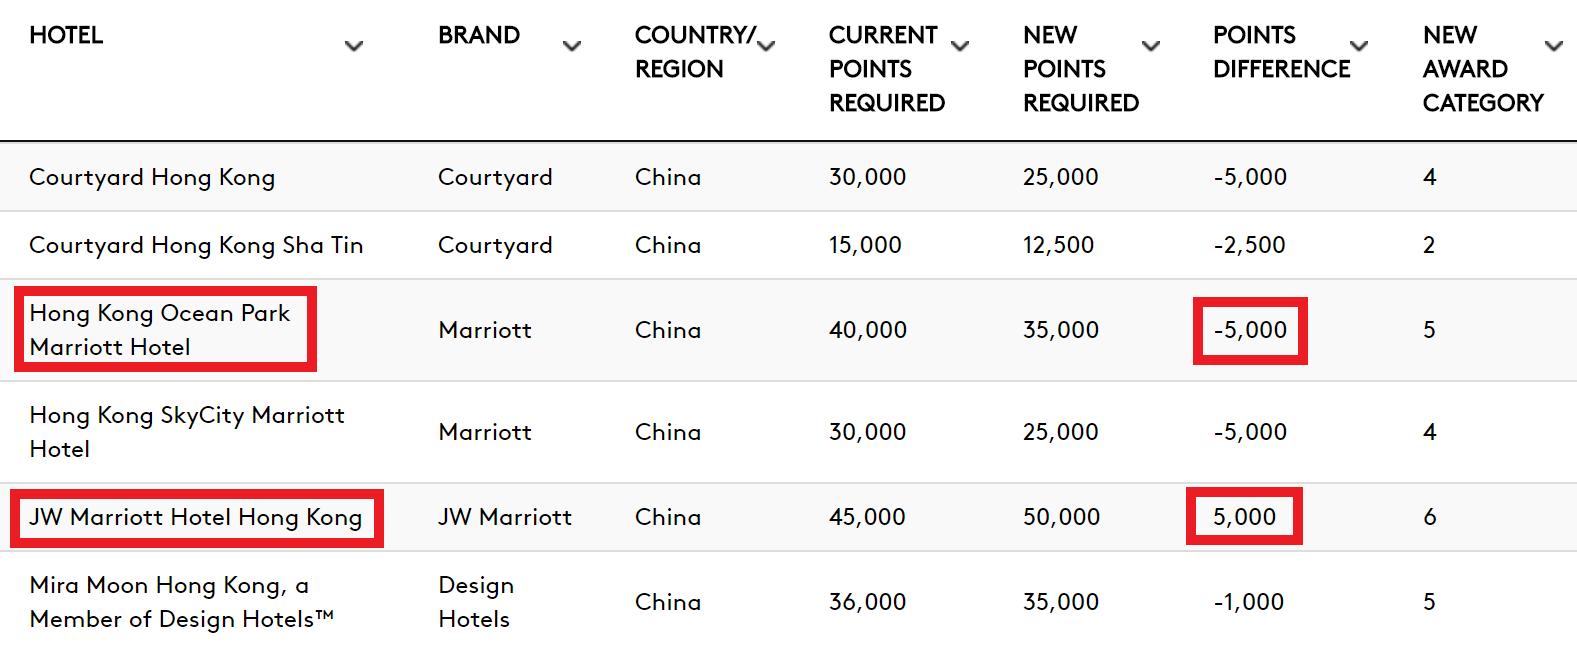 image via https://points-redemption.marriott.com/category-change